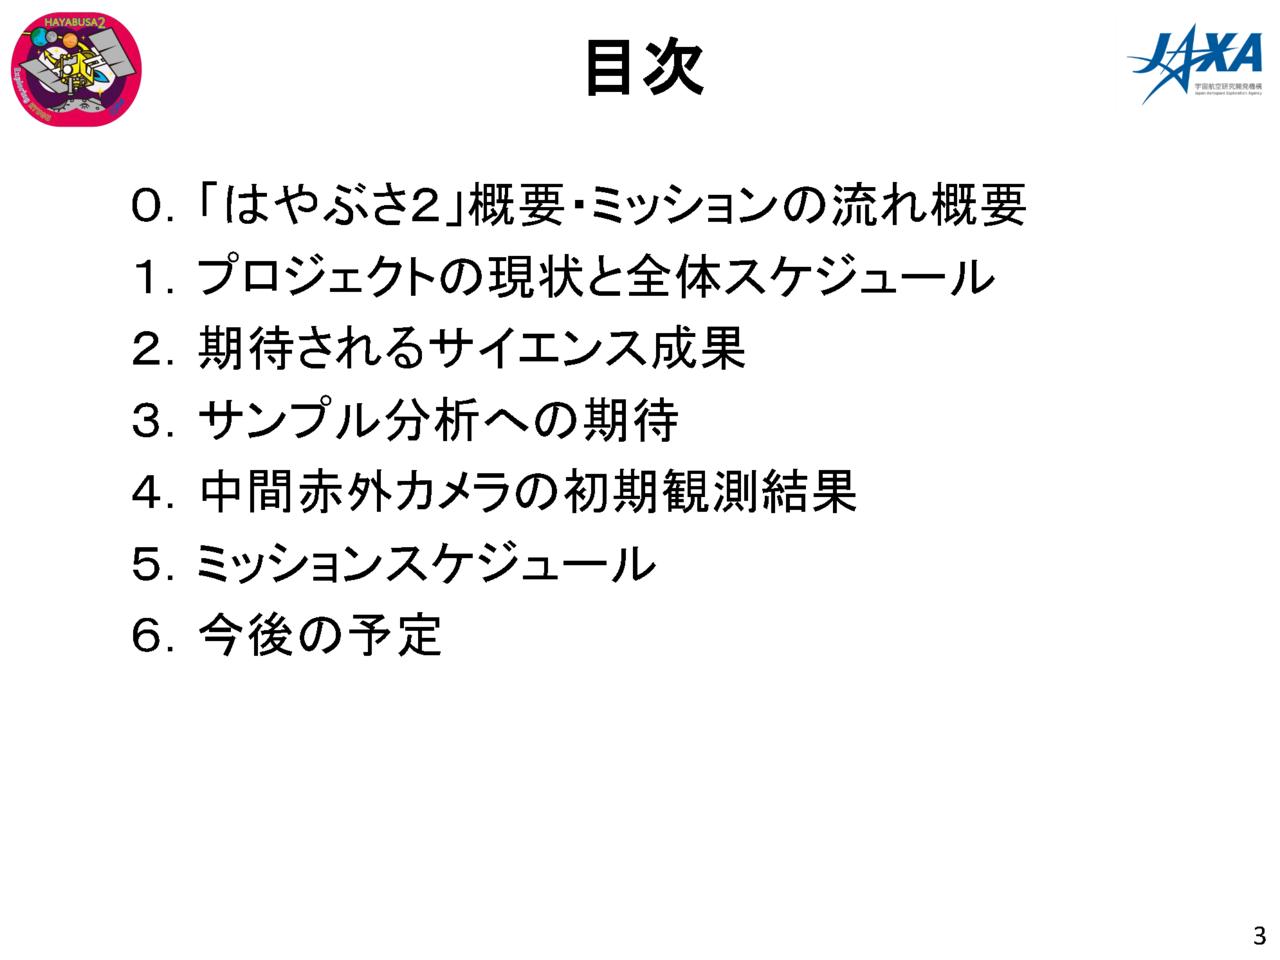 f:id:Imamura:20180719131658p:plain